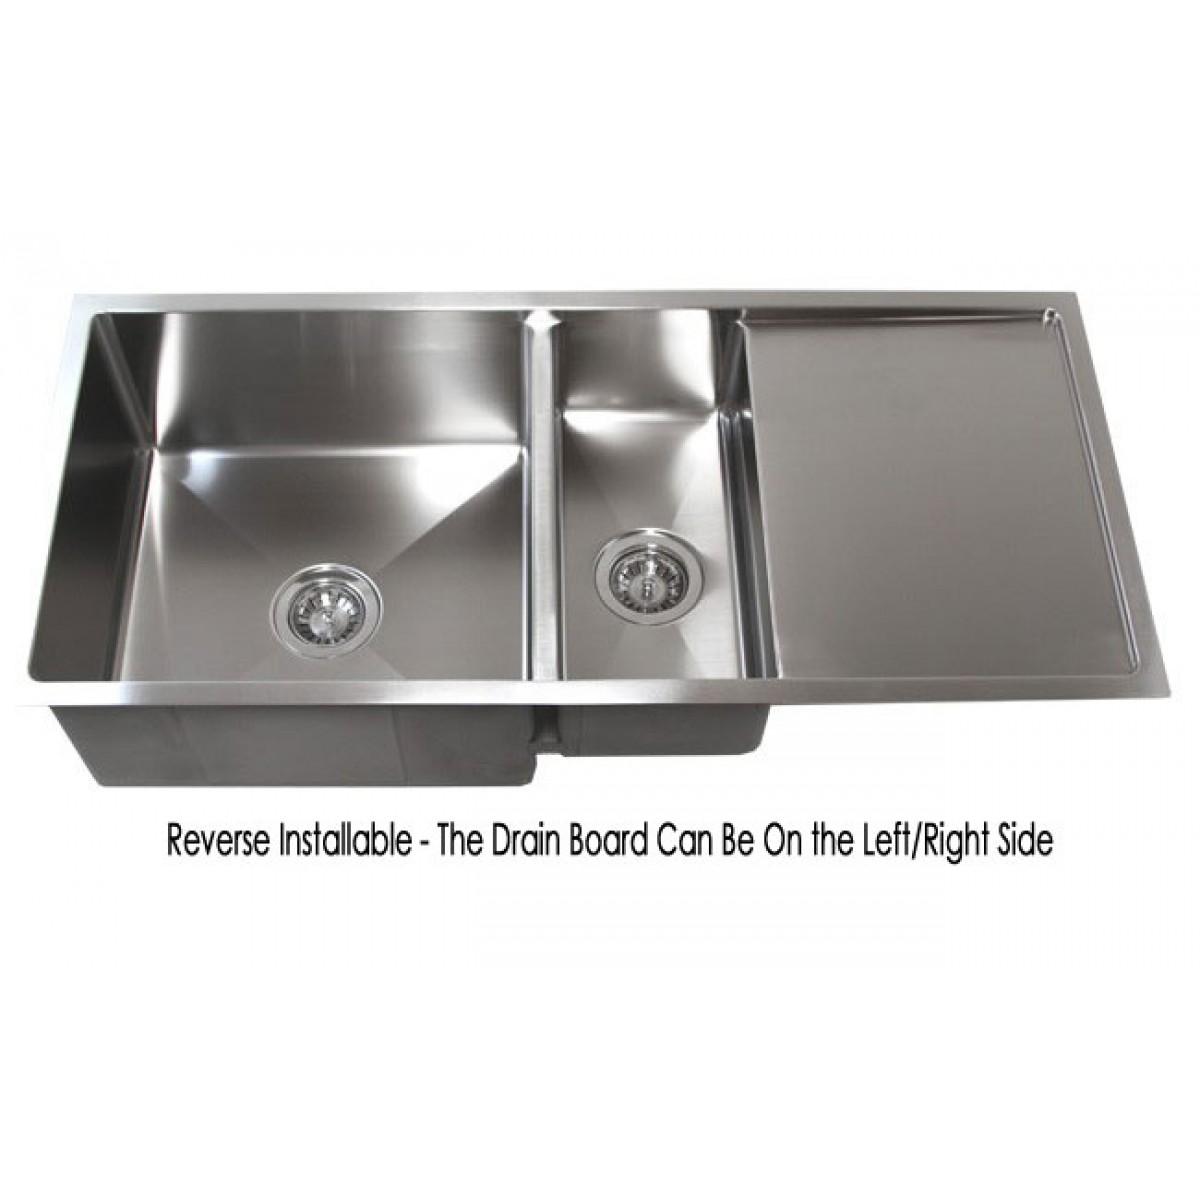 Used Kitchen Sink: 42 Inch Stainless Steel Undermount Double Bowl Kitchen